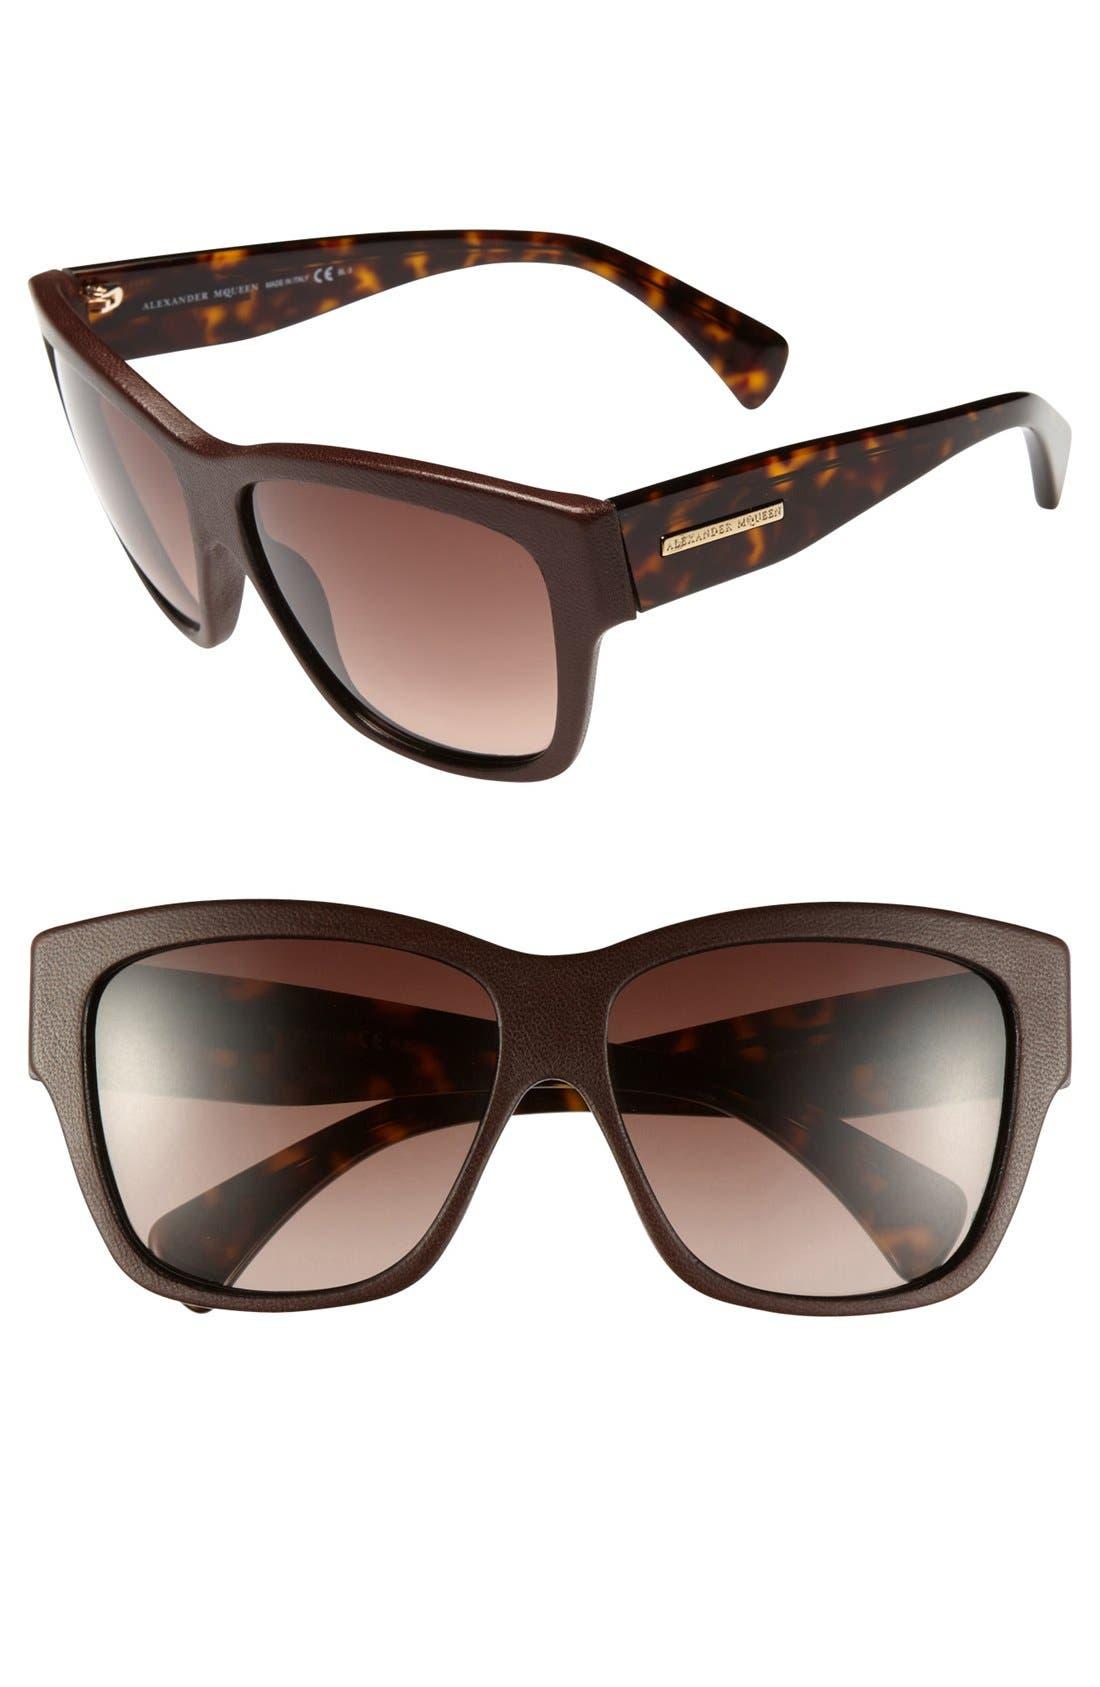 Main Image - Alexander McQueen 59mm Retro Sunglasses